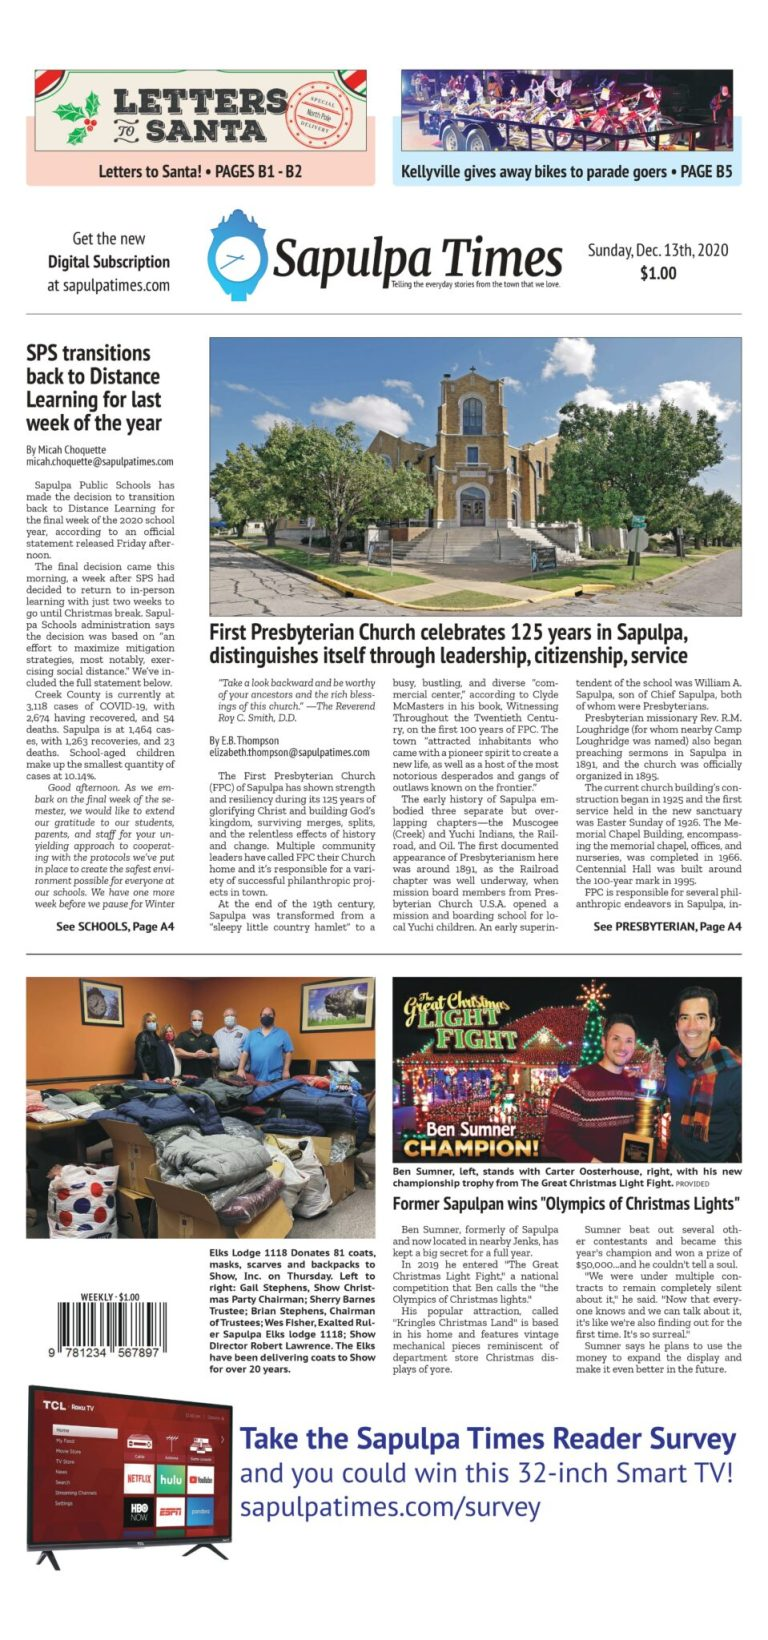 Sapulpa Times Digital Edition 12/13/2020